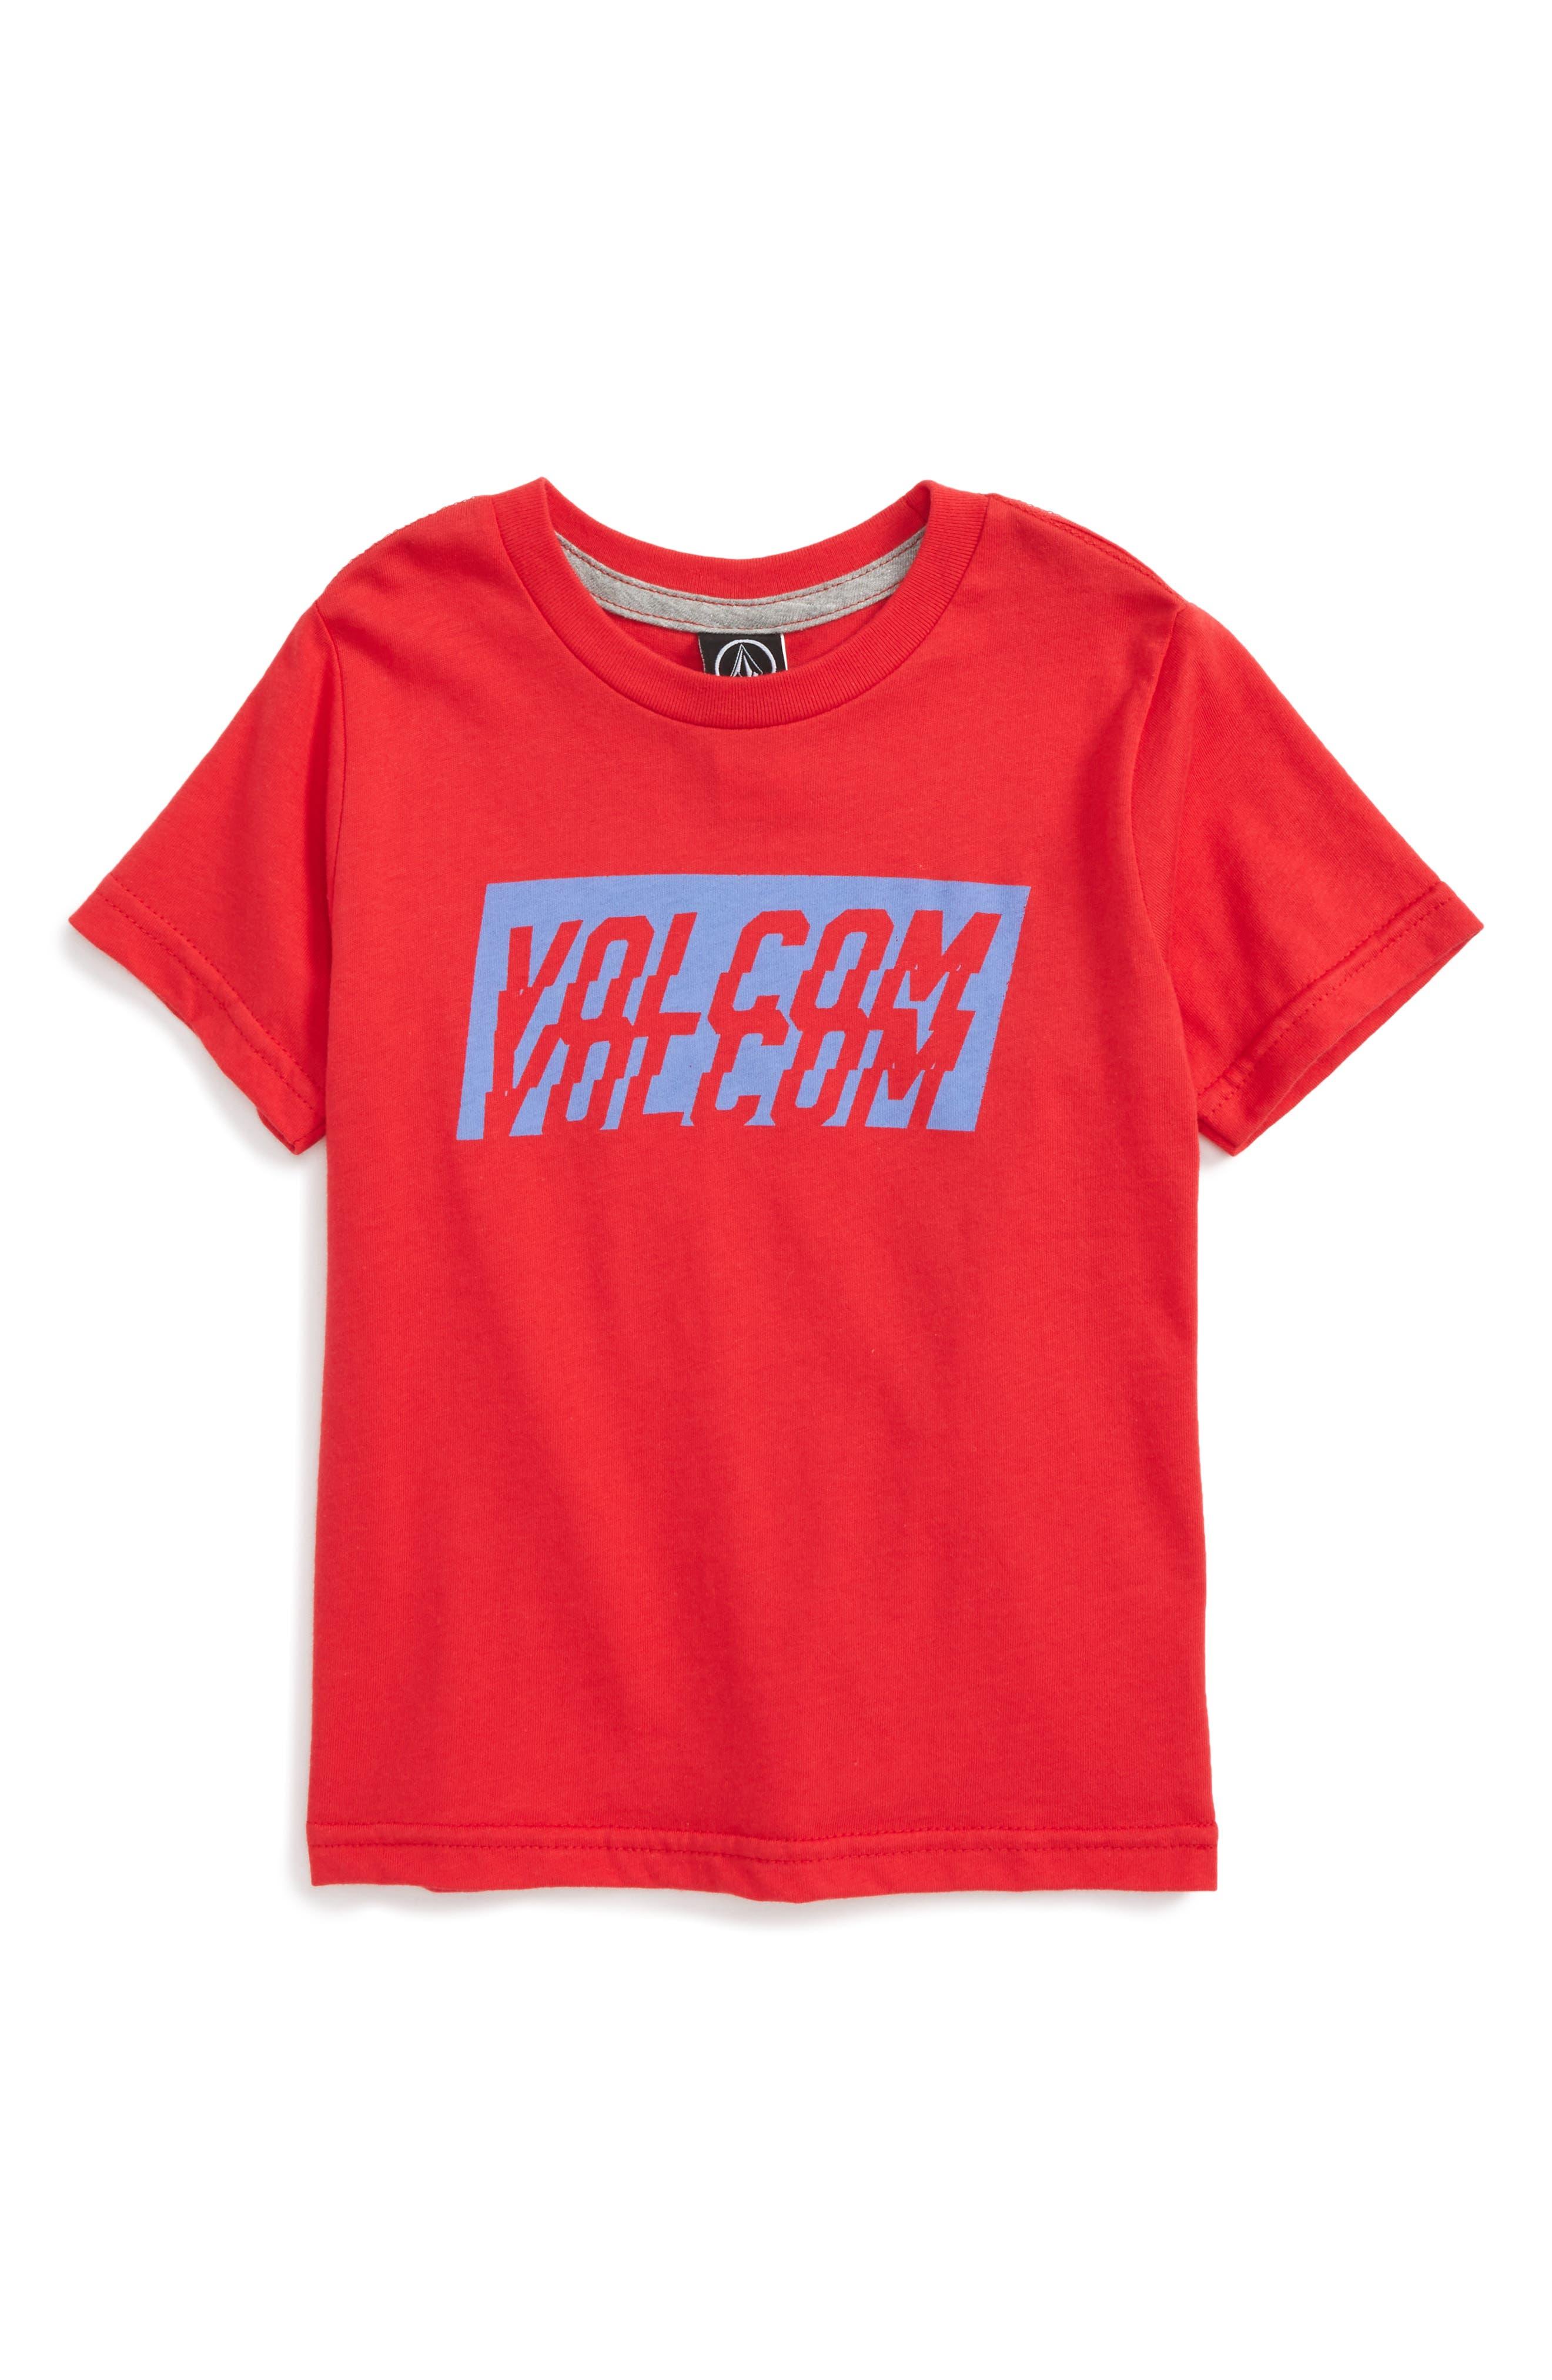 Volcom Chopper Graphic T-Shirt (Toddler Boys, Little Boys & Big Boys)